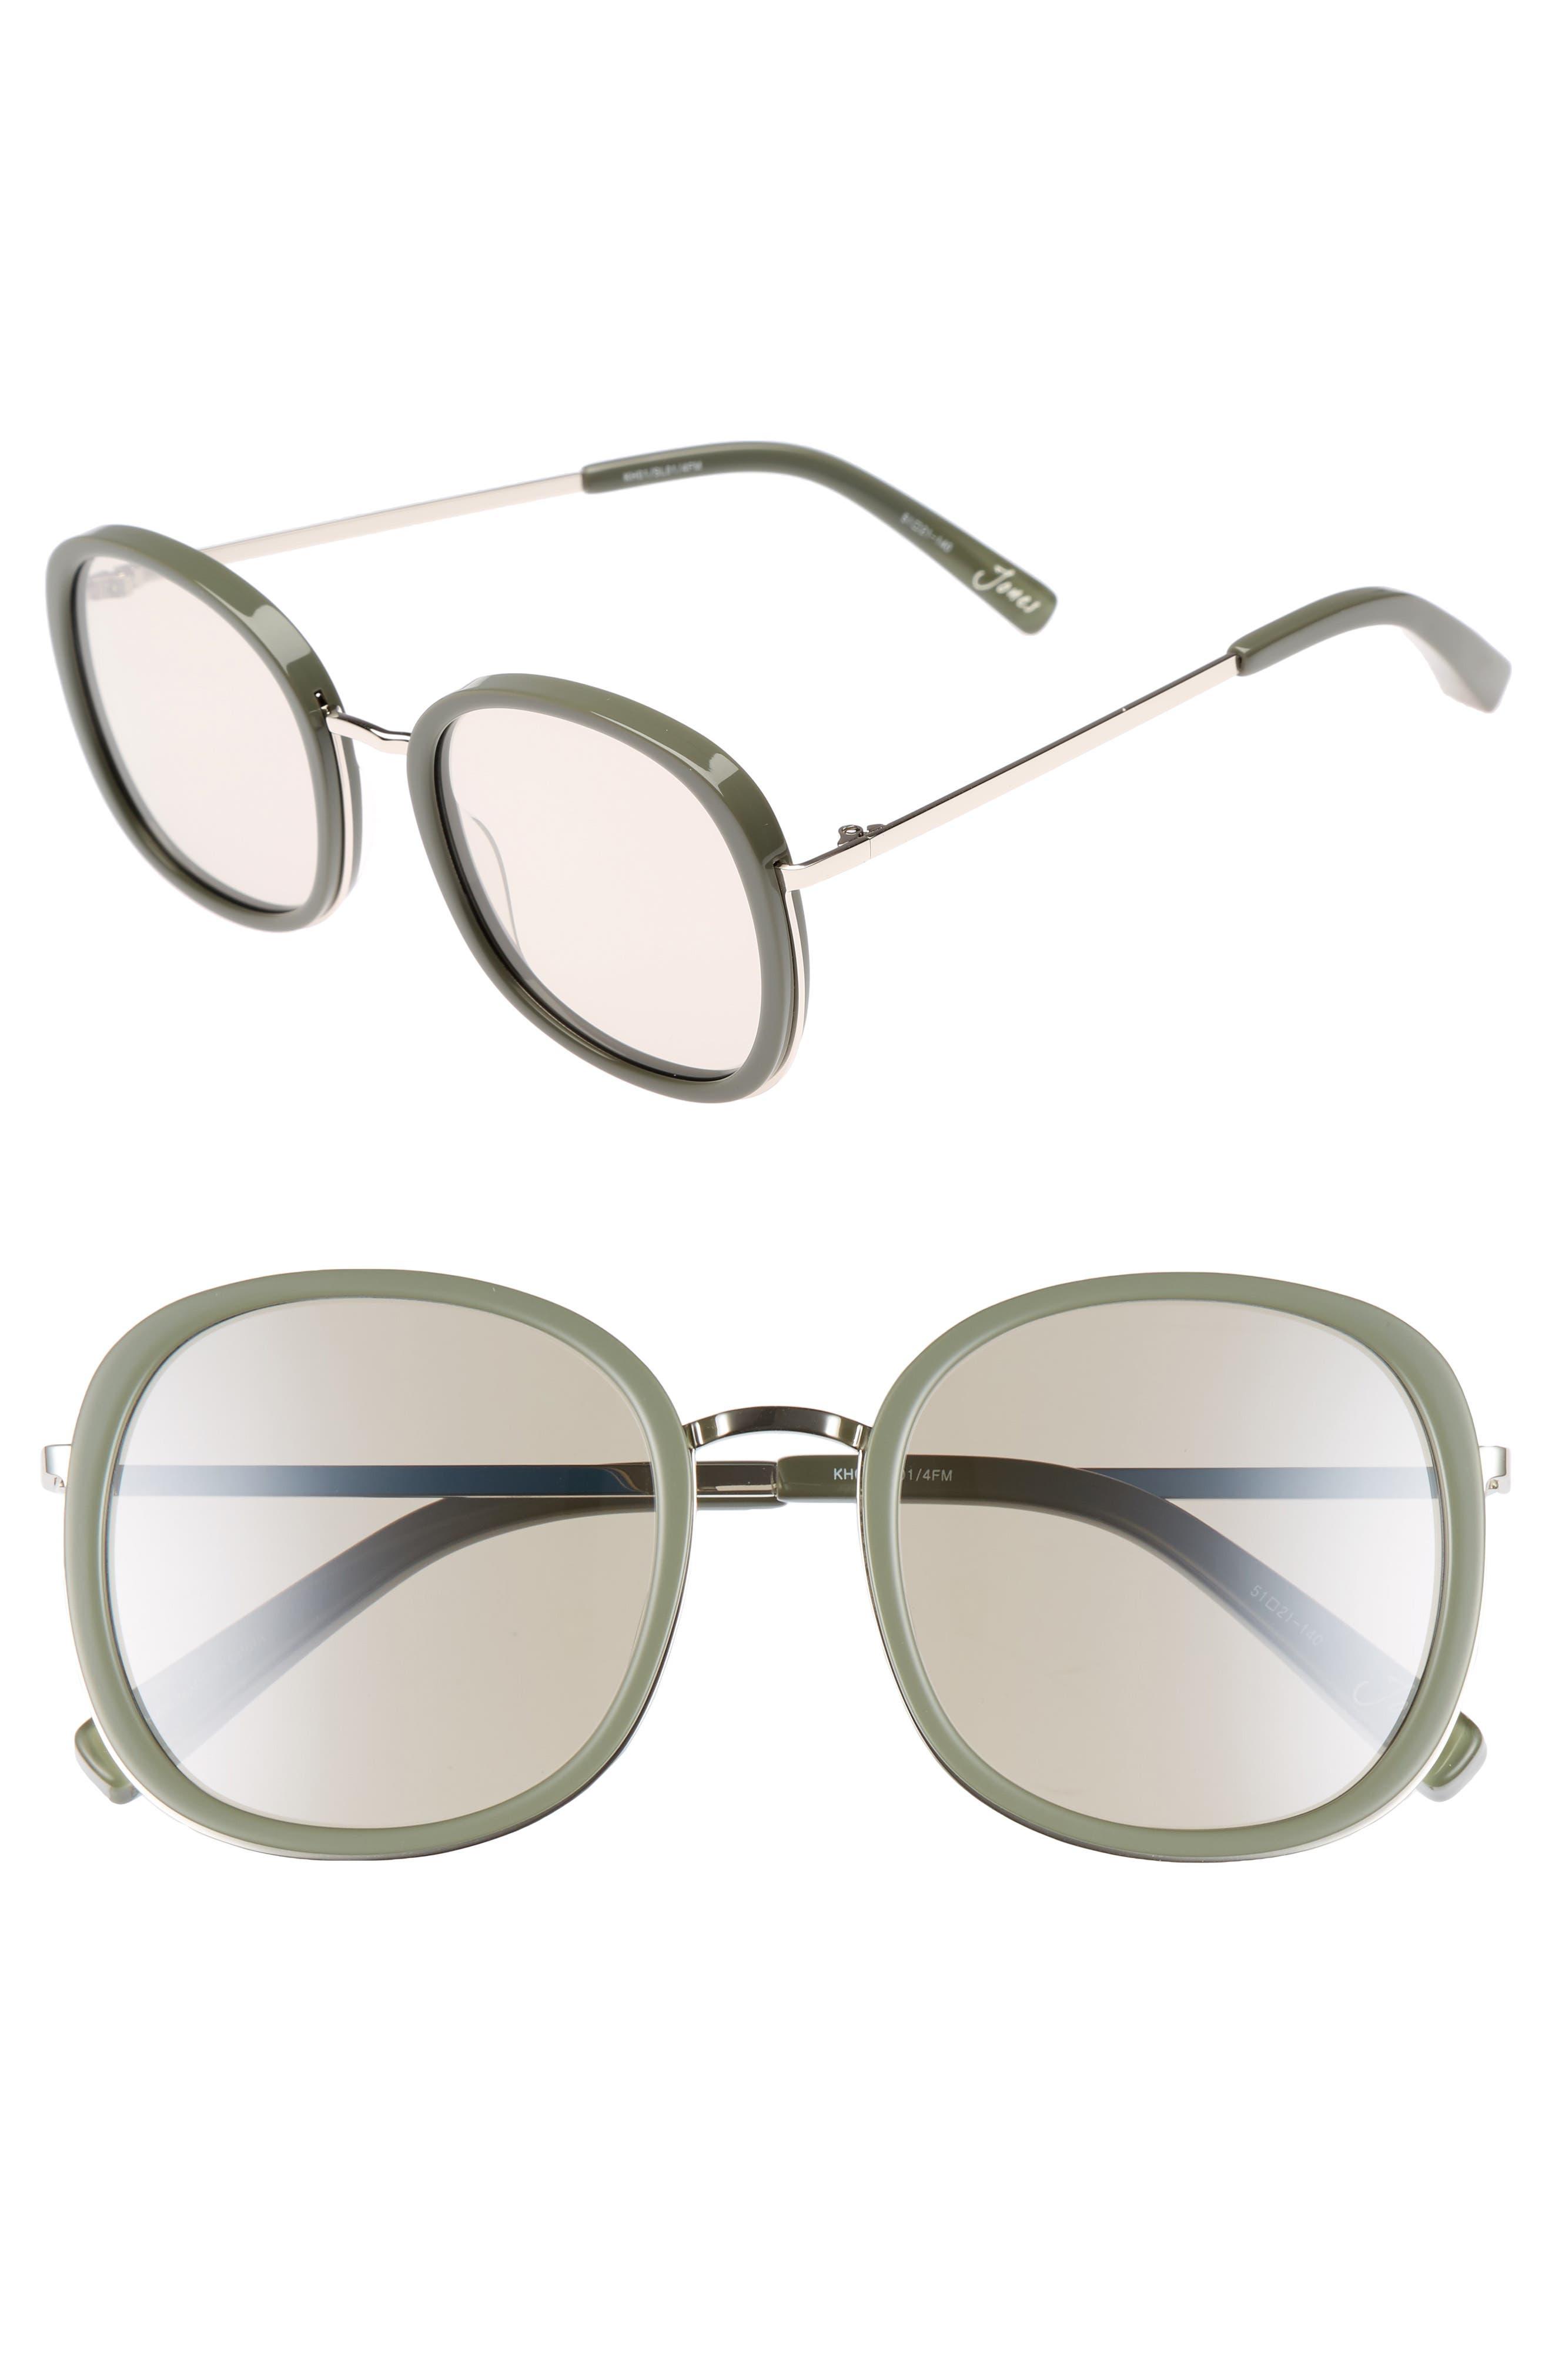 Jones 51mm Round Sunglasses,                         Main,                         color, Khaki And Silver